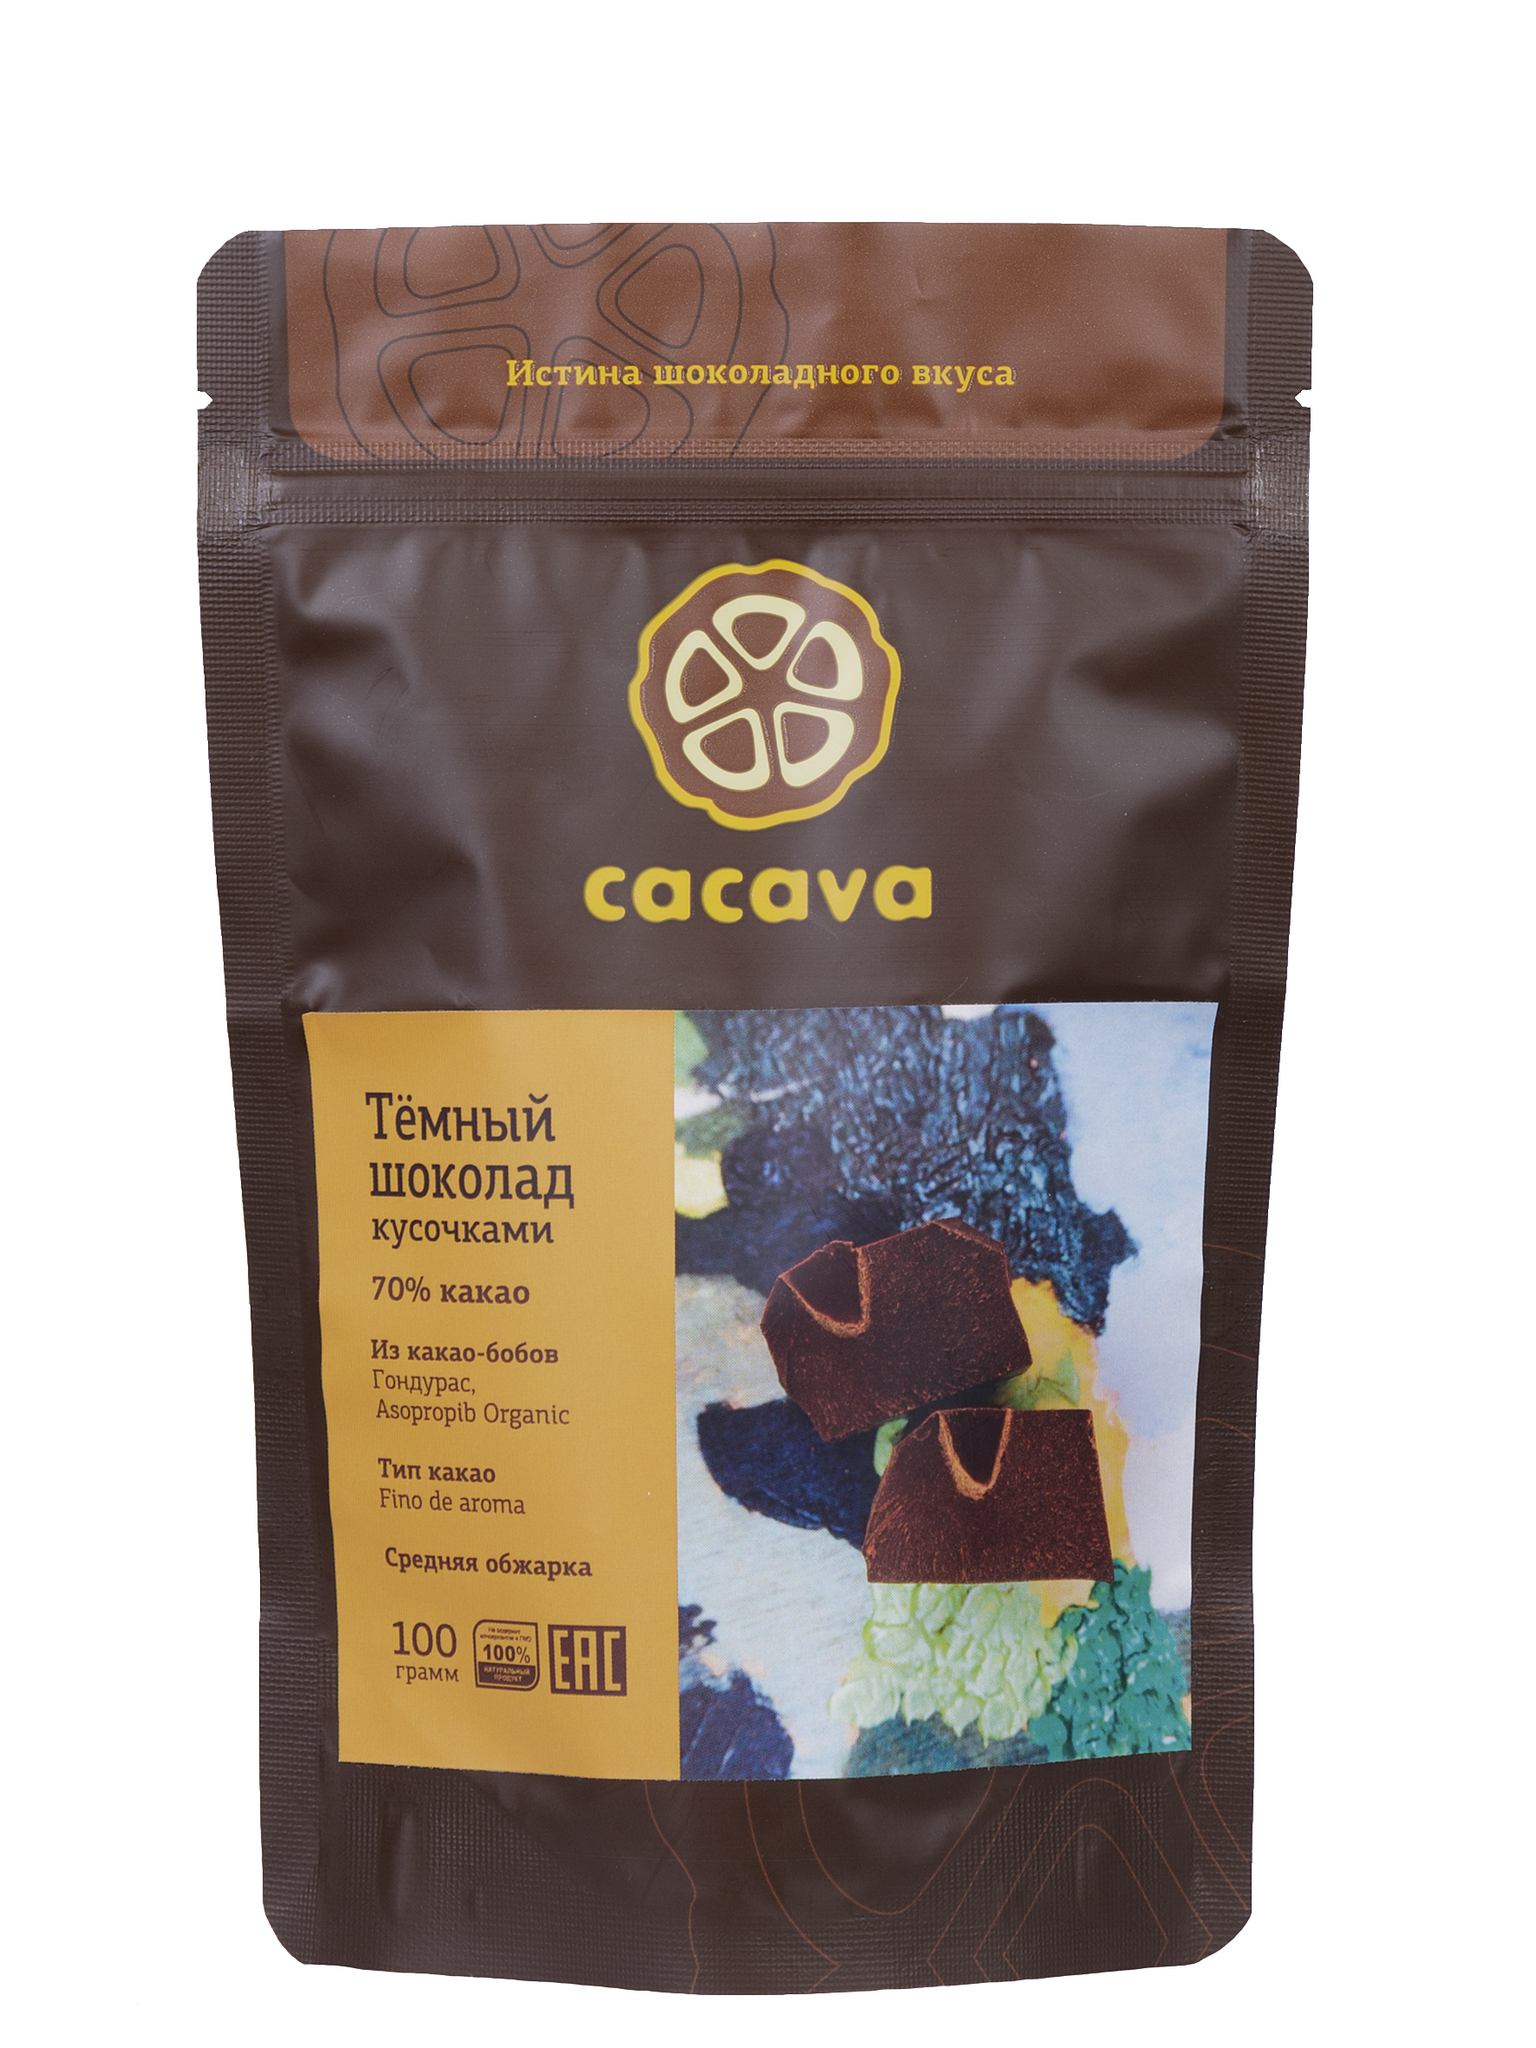 Тёмный шоколад 70 % какао (Гондурас, Asopropib), упаковка 100 грамм